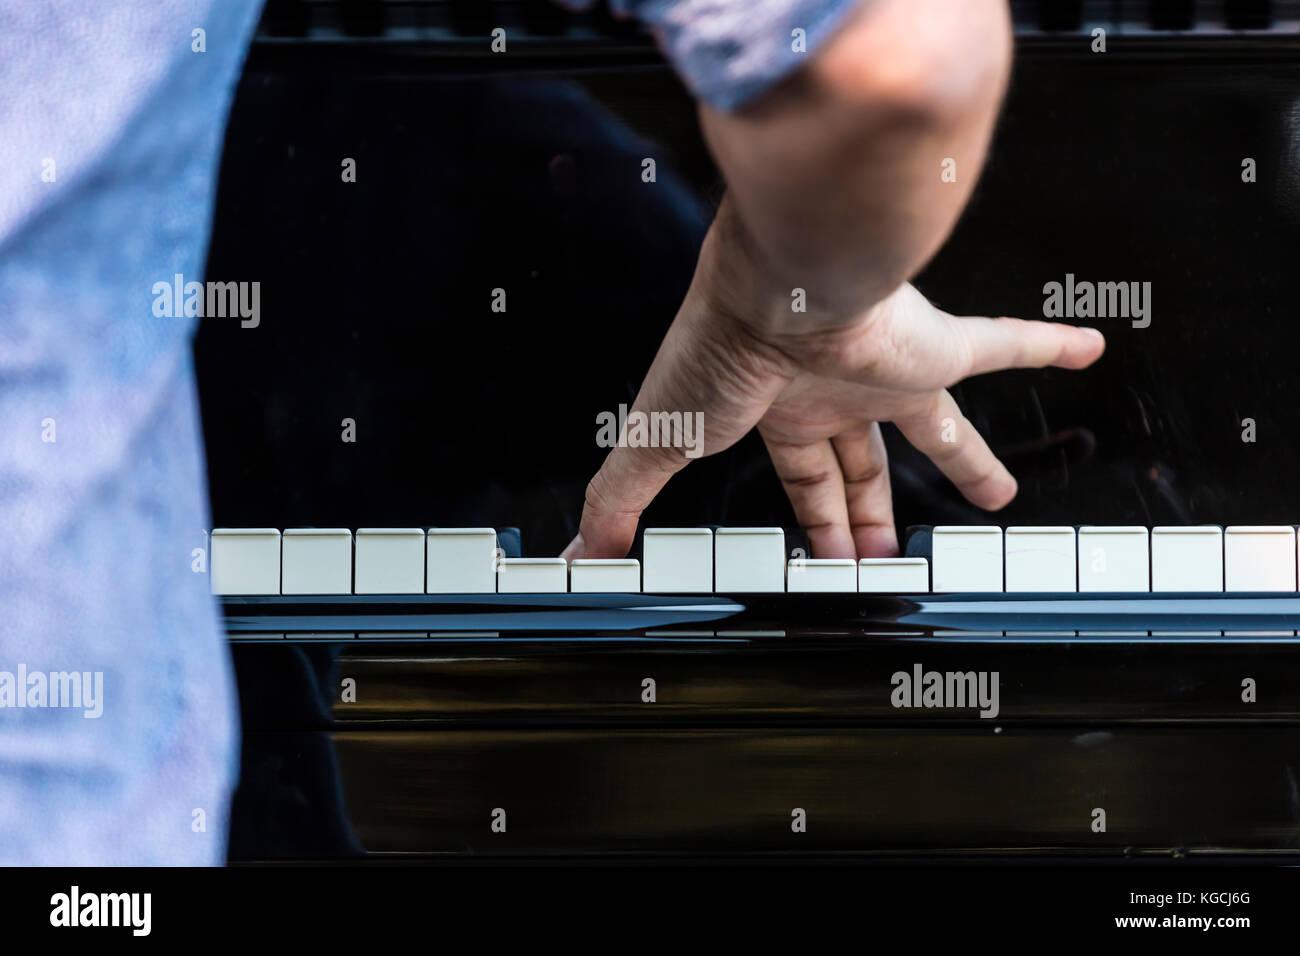 FABIAN ALMAZAN plays keyboards for THE LINDA MAY HAN OH QUINTET - 60th MONTEREY JAZZ FESTIVAL, CALIFORNIA - Stock Image